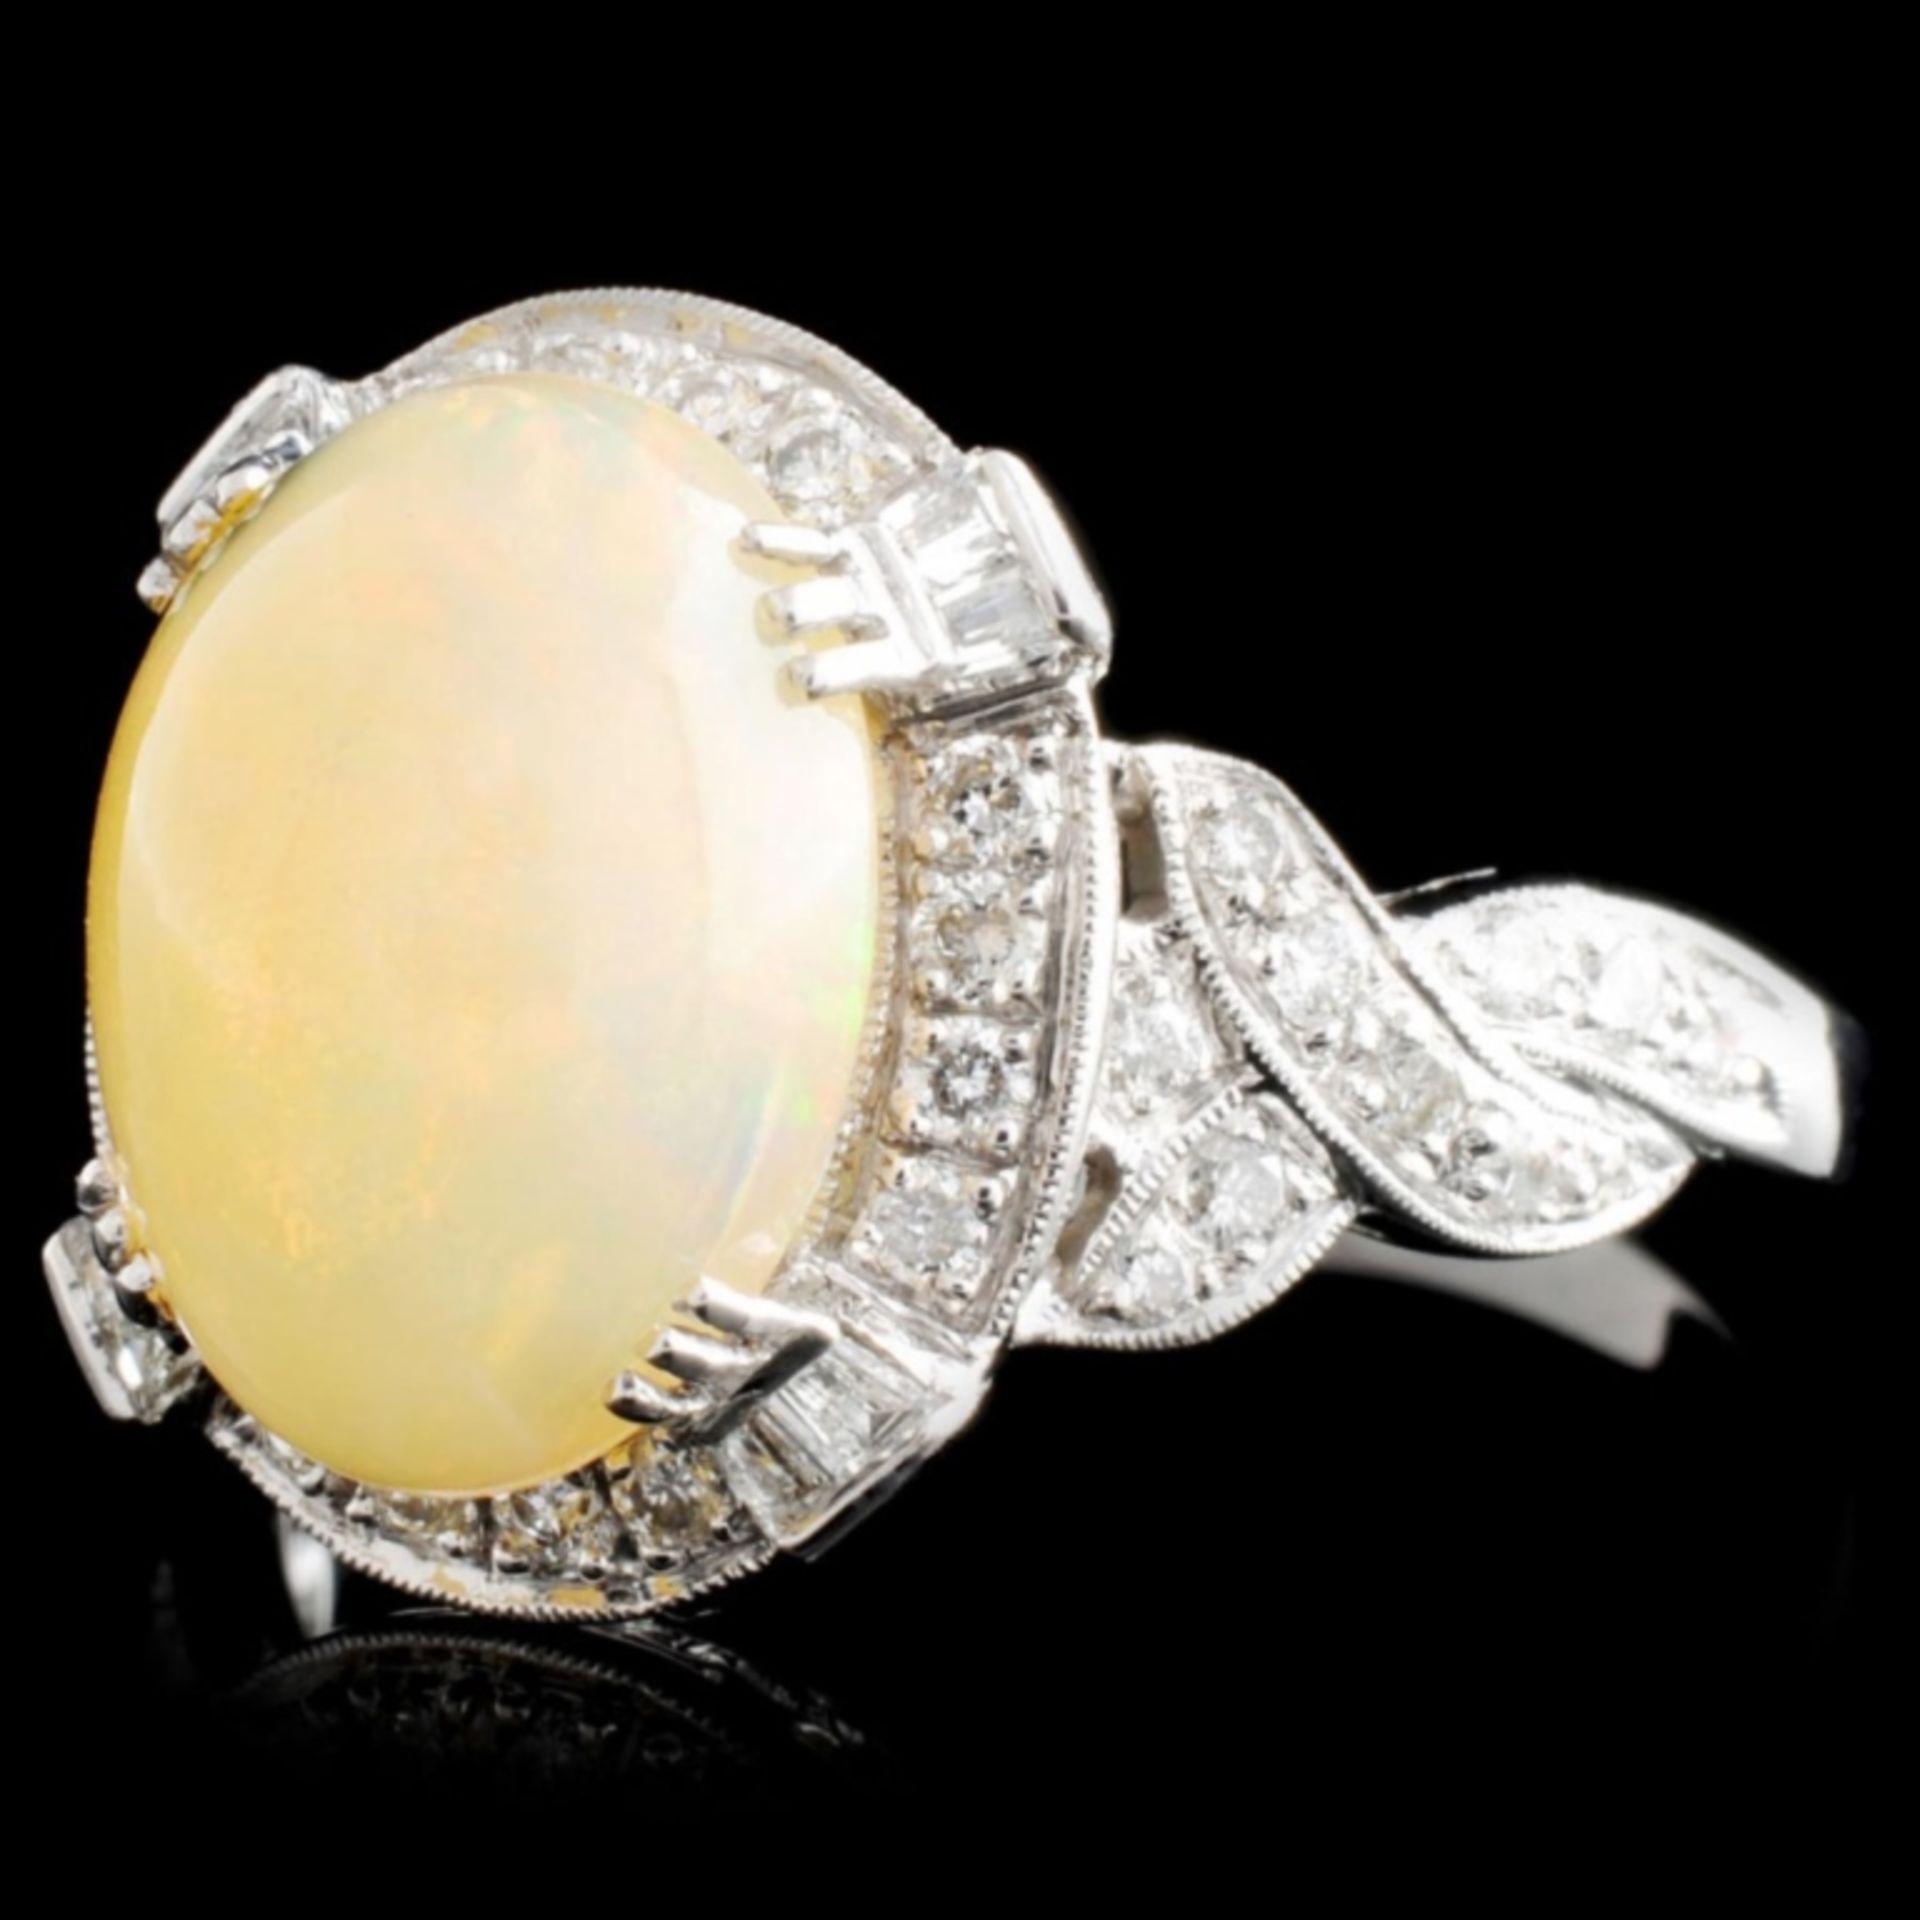 18K Gold 2.14ct Opal & 0.48ctw Diamond Ring - Image 2 of 5